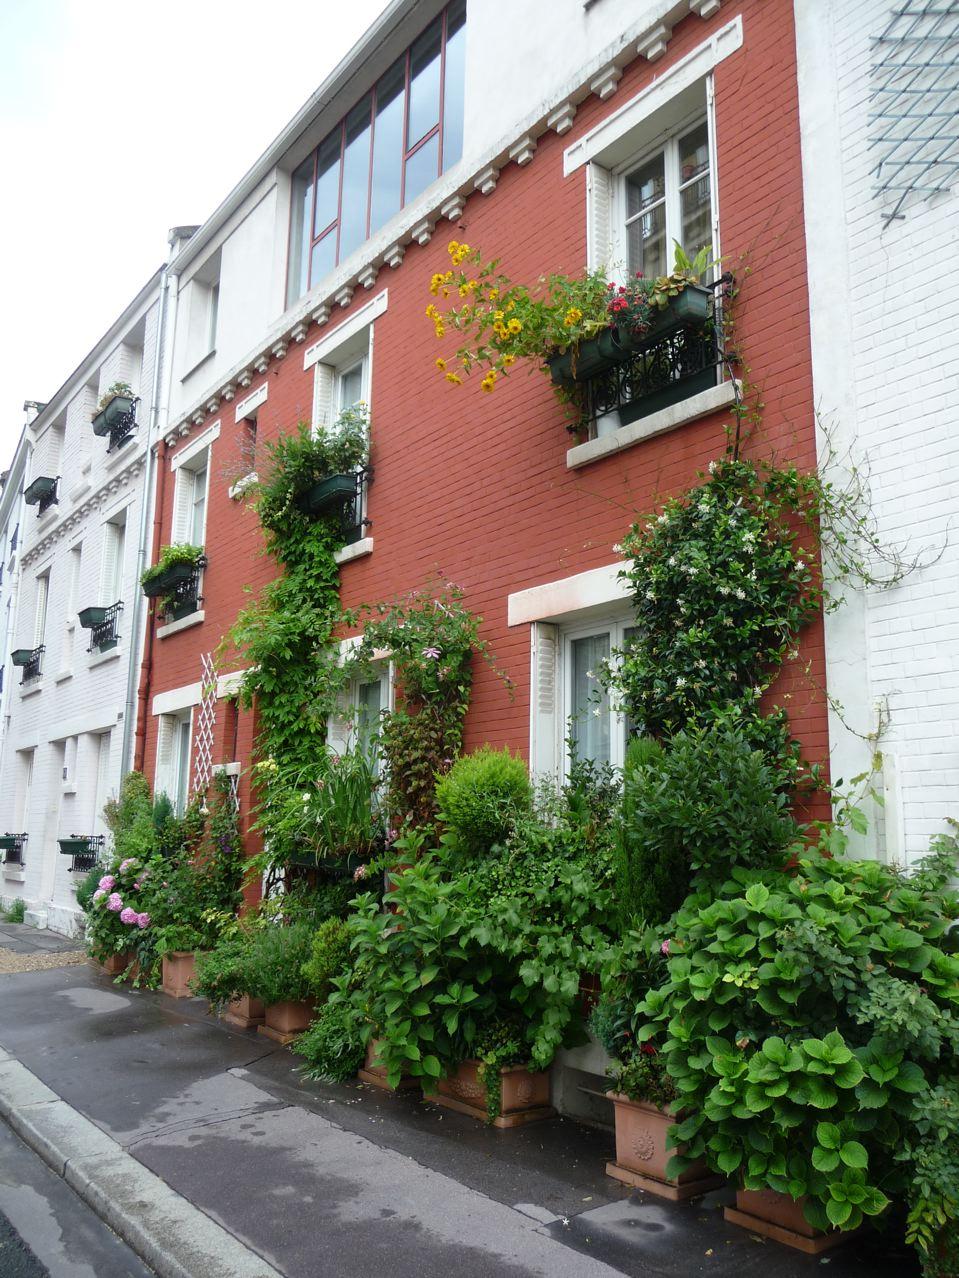 Jardin de façade en ville